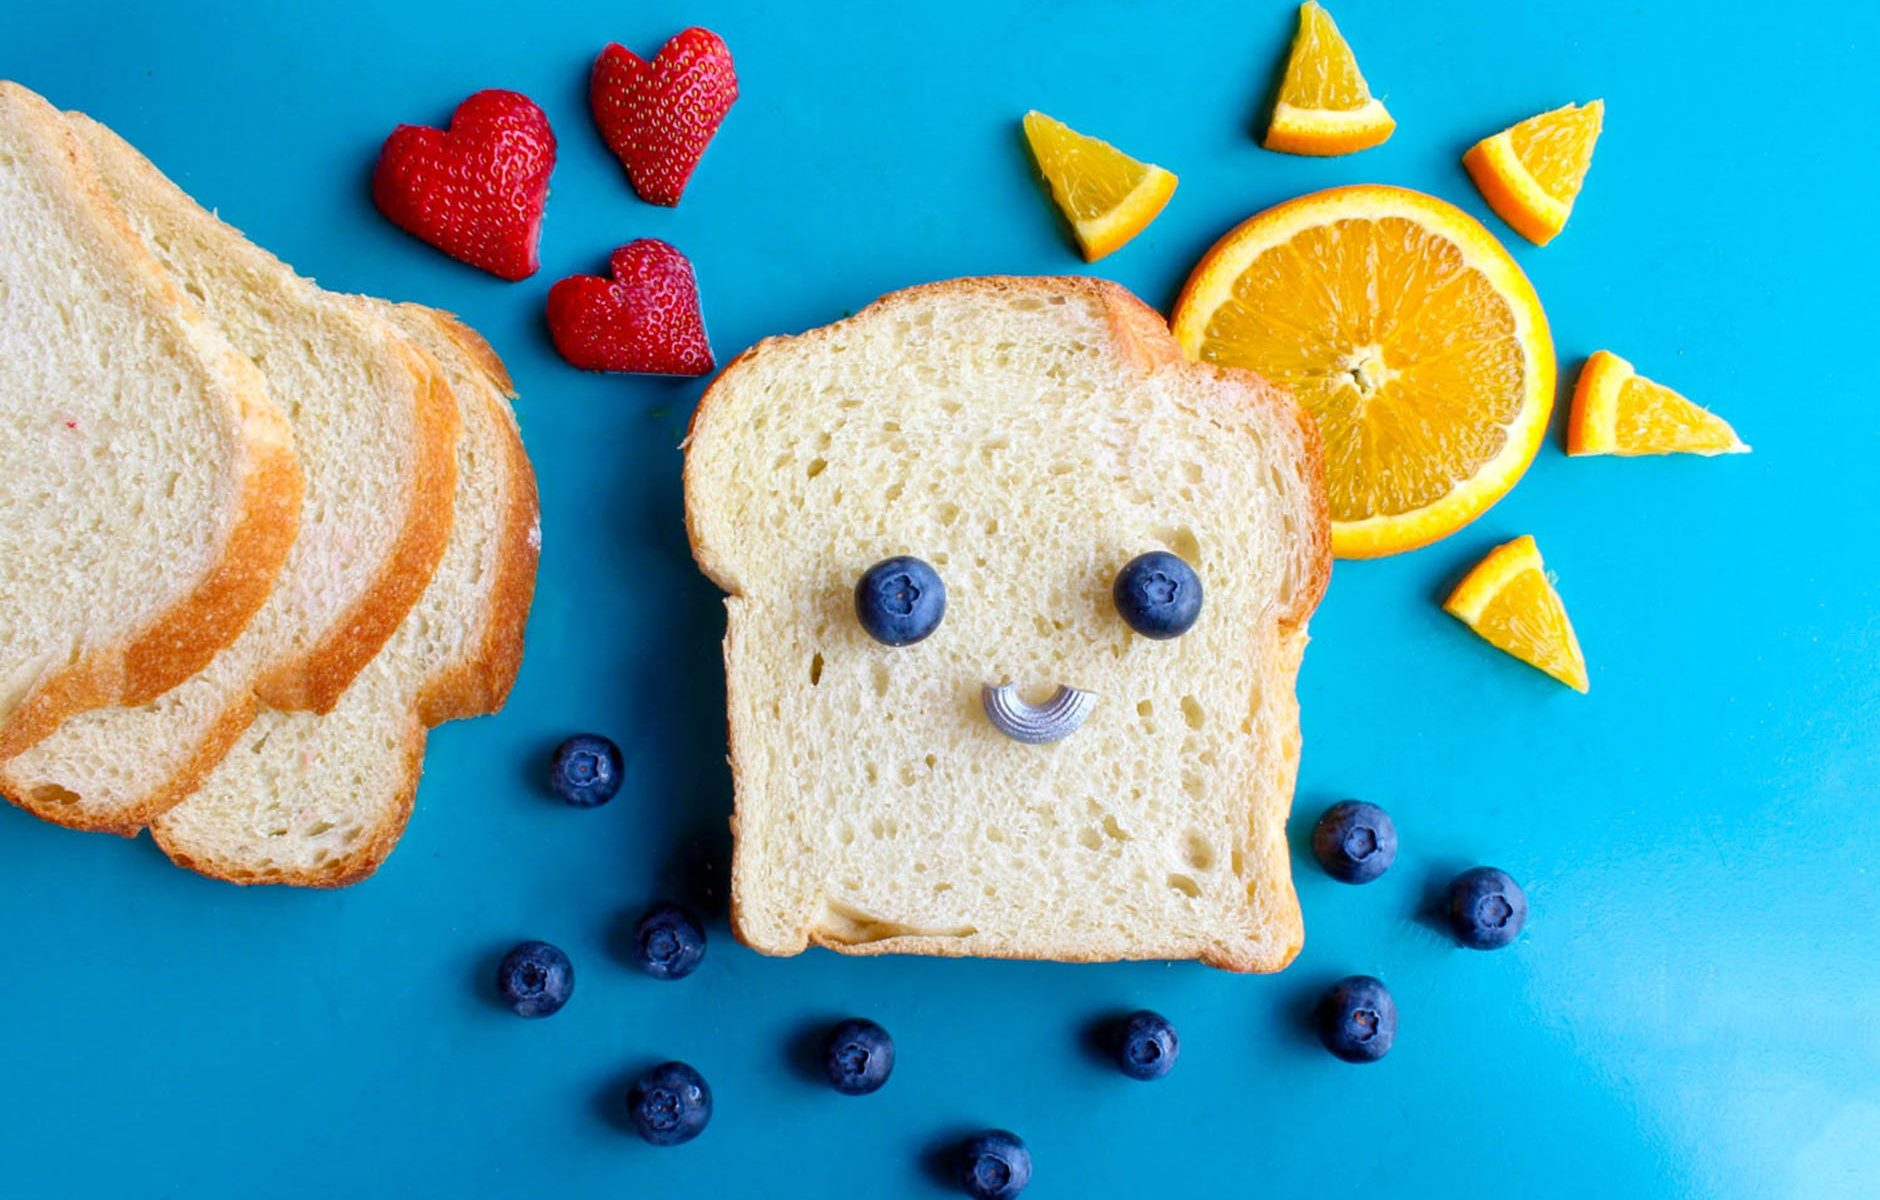 Healthy Food Healthy Mind